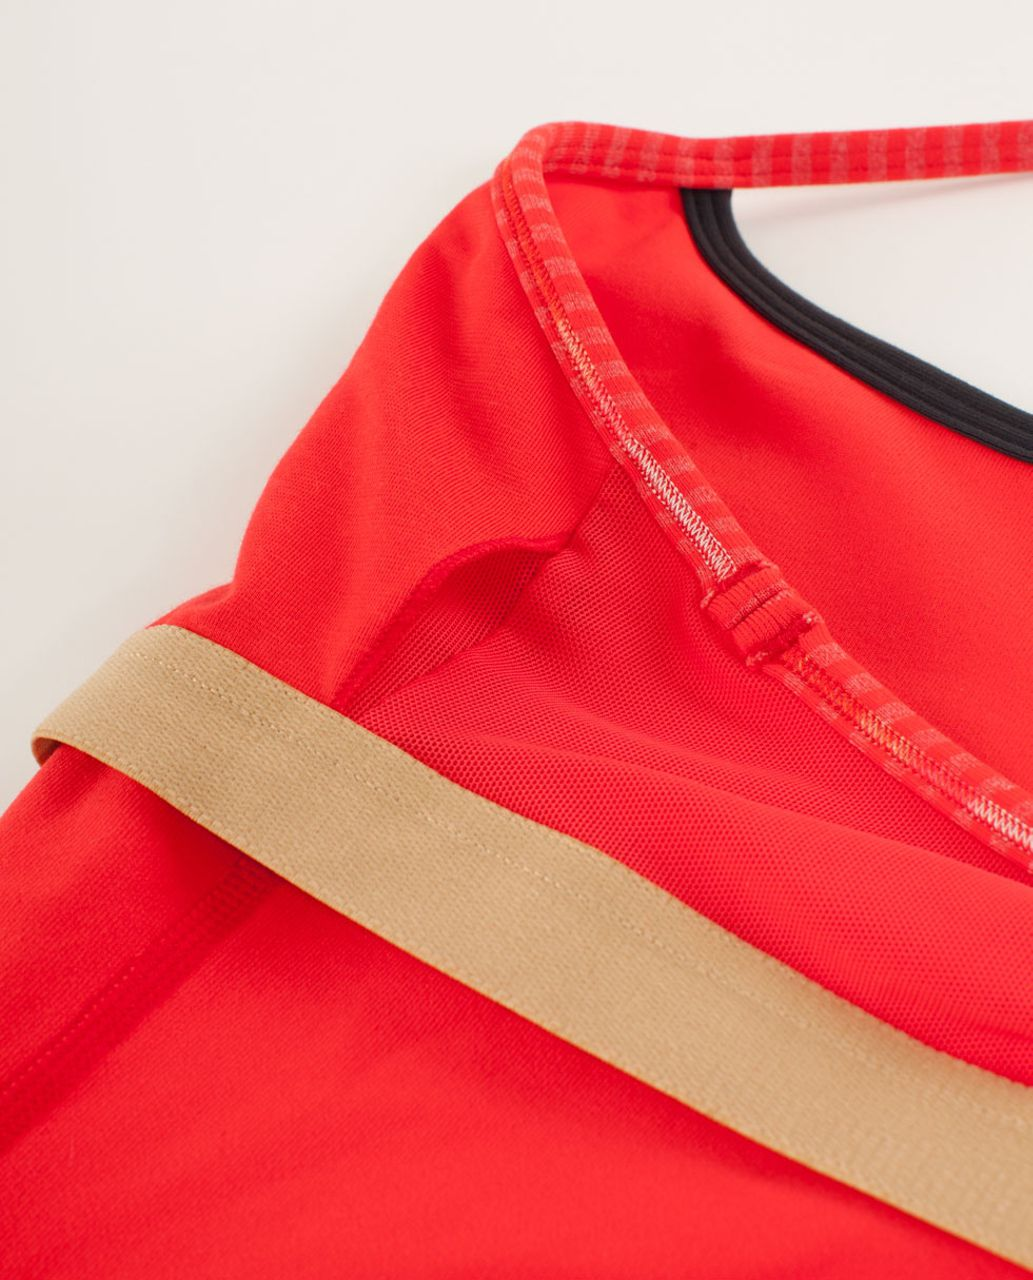 Lululemon Power Y Tank *Luon Light - Love Red / Slope Stripe Love Red Heathered Fiery Red / Deep Coal